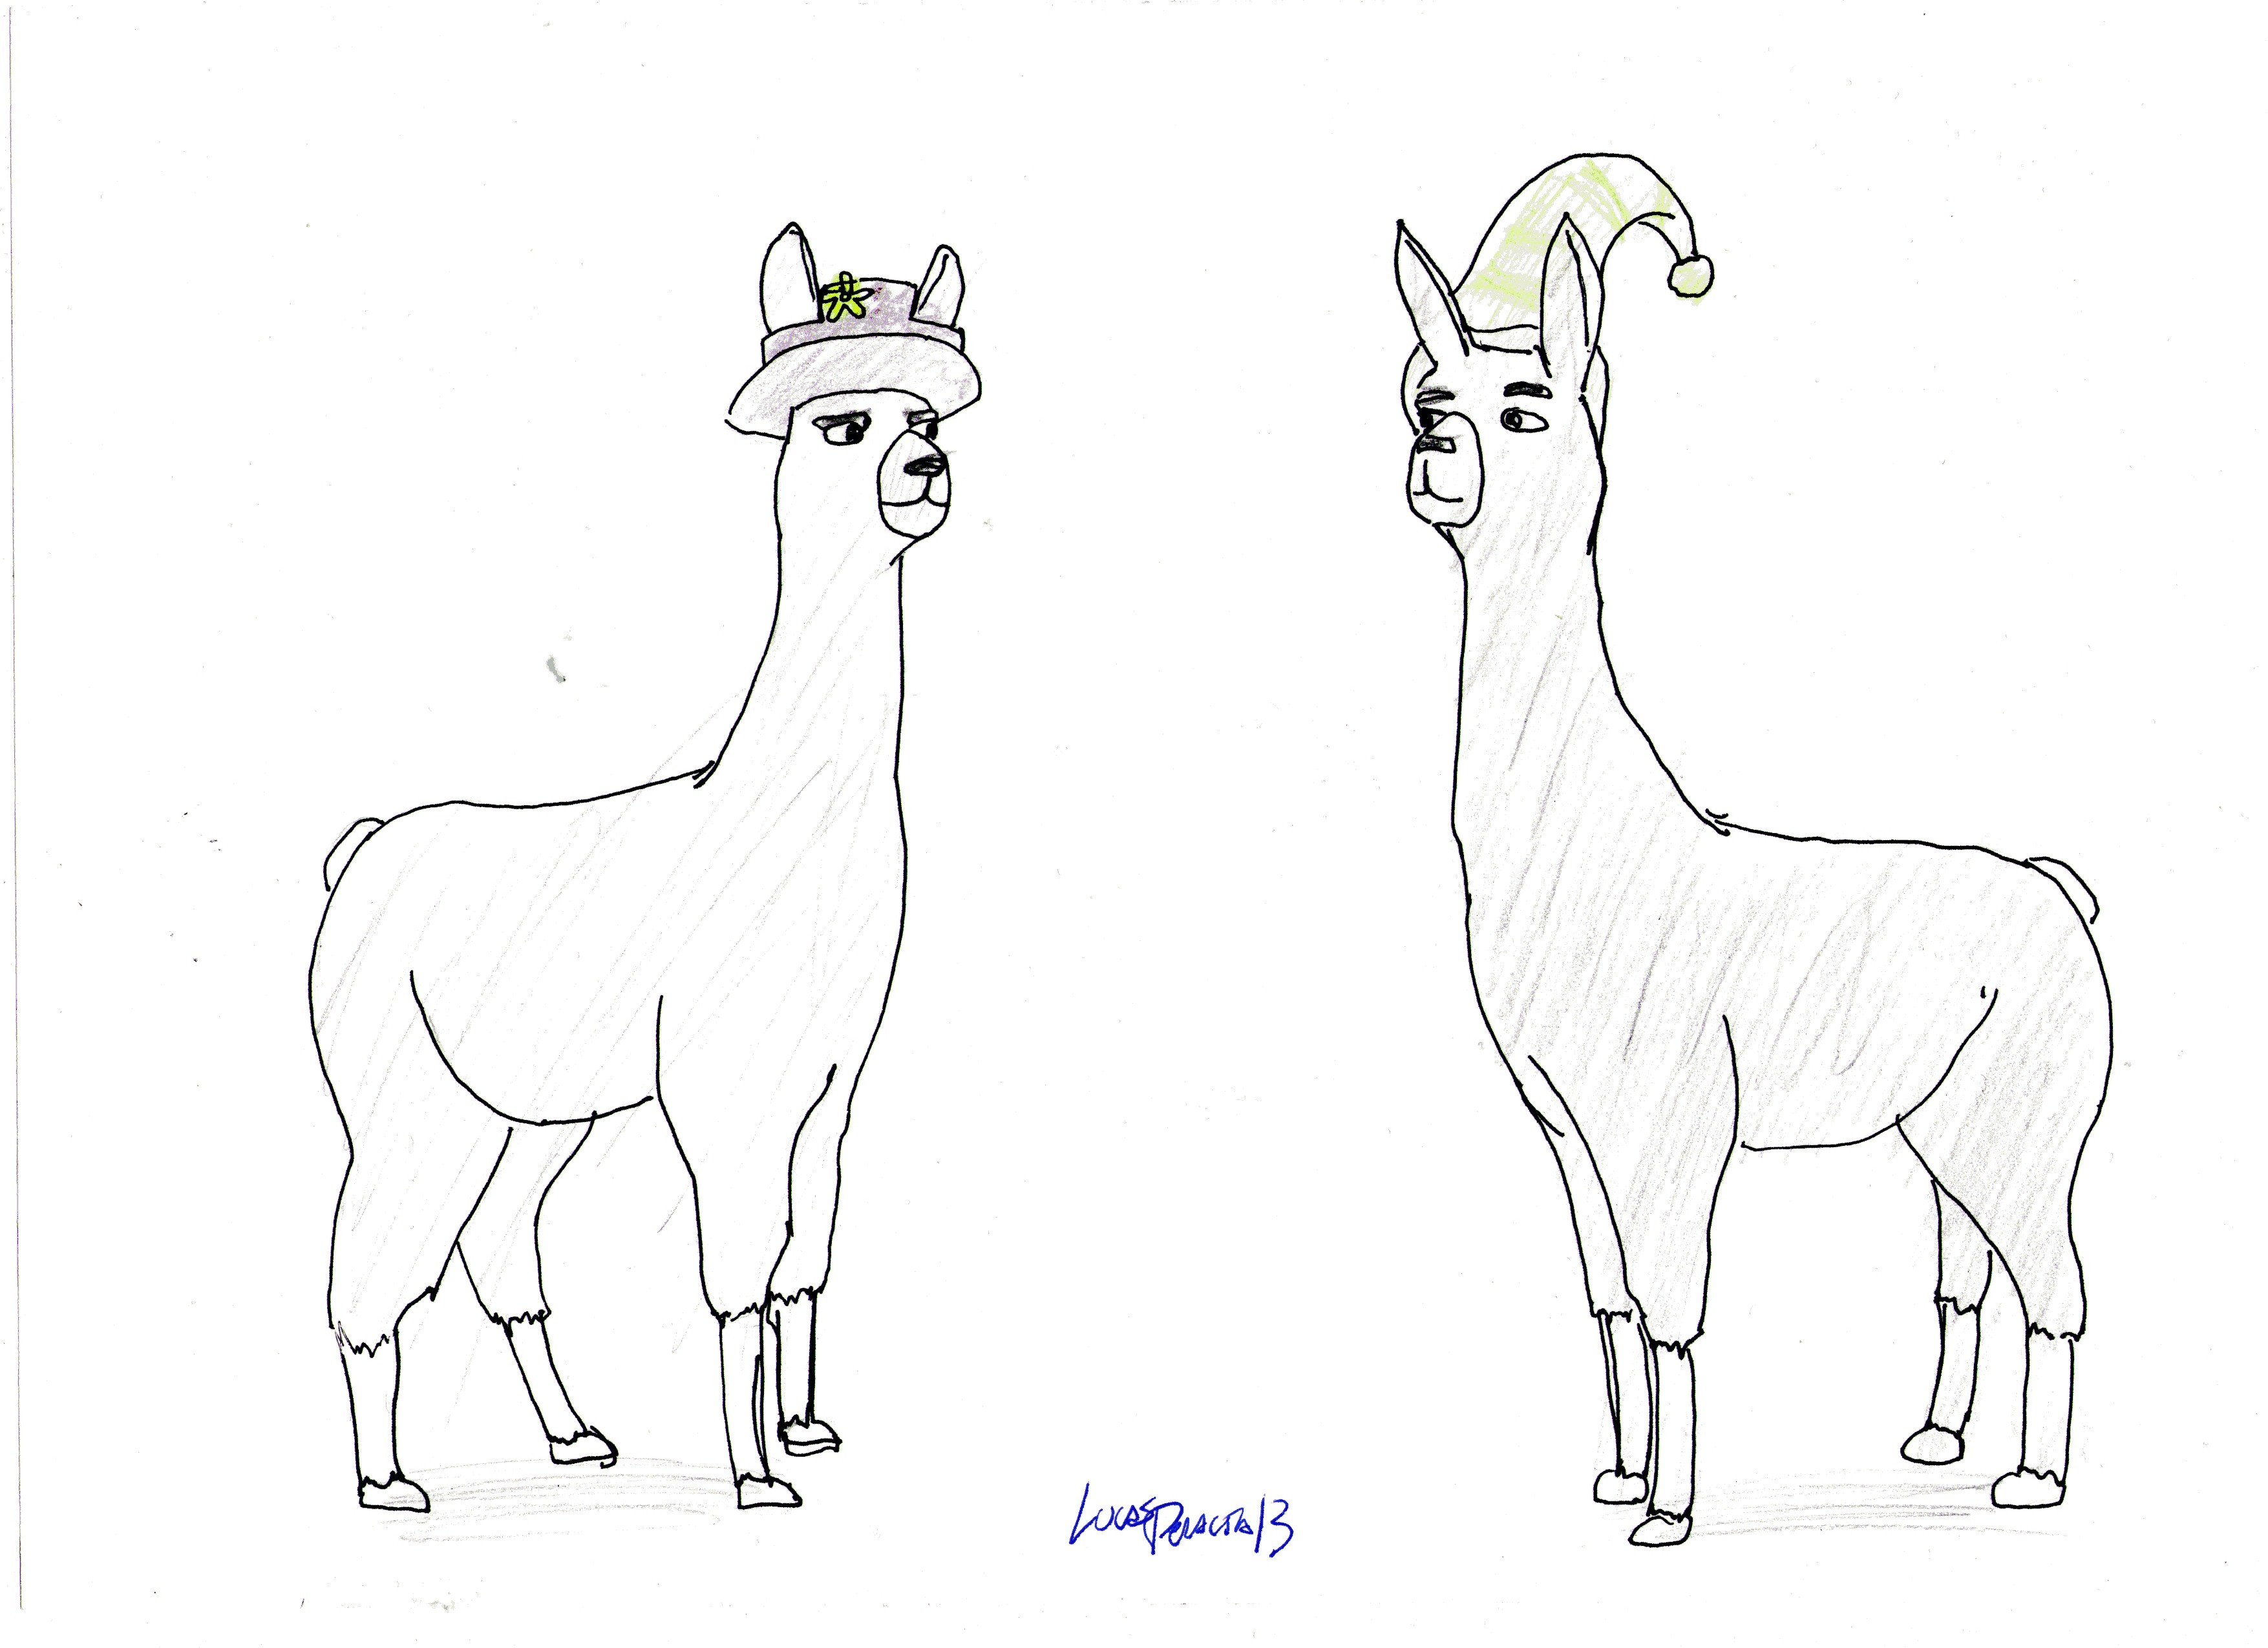 Llamas with hats by lukasperalta13 on deviantart